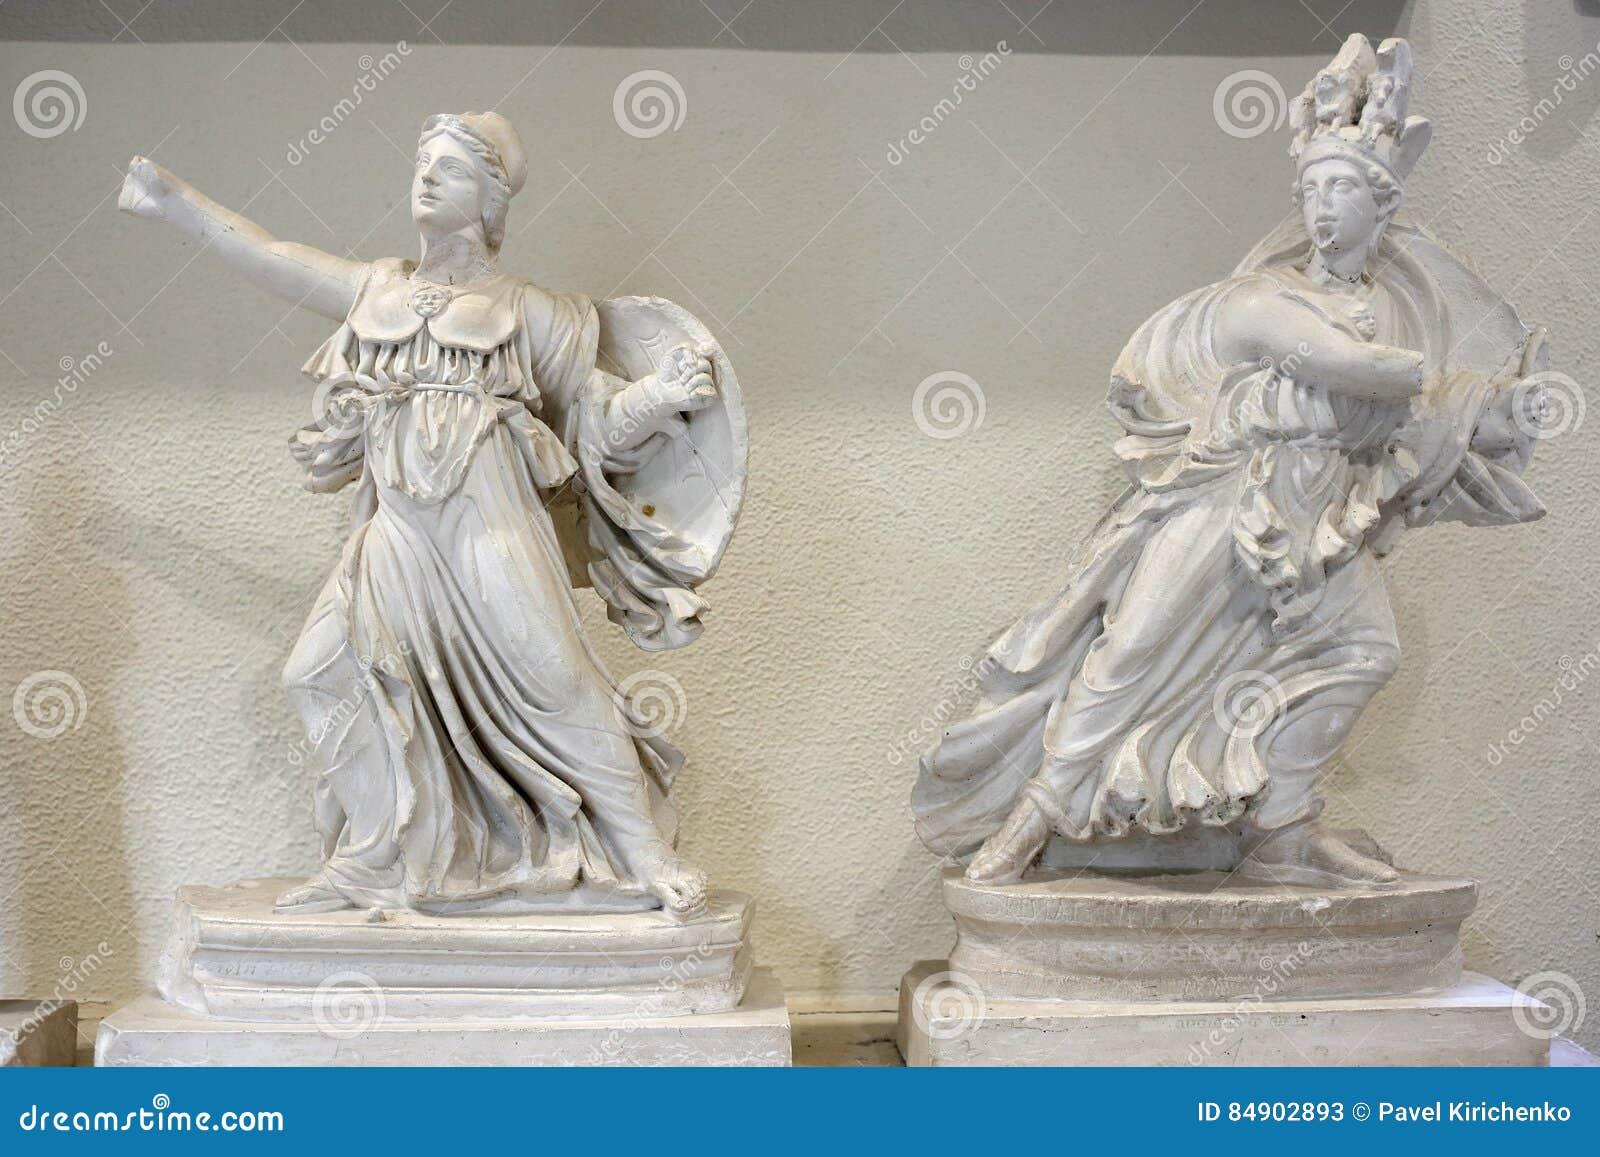 Statues in museum of Epidauros